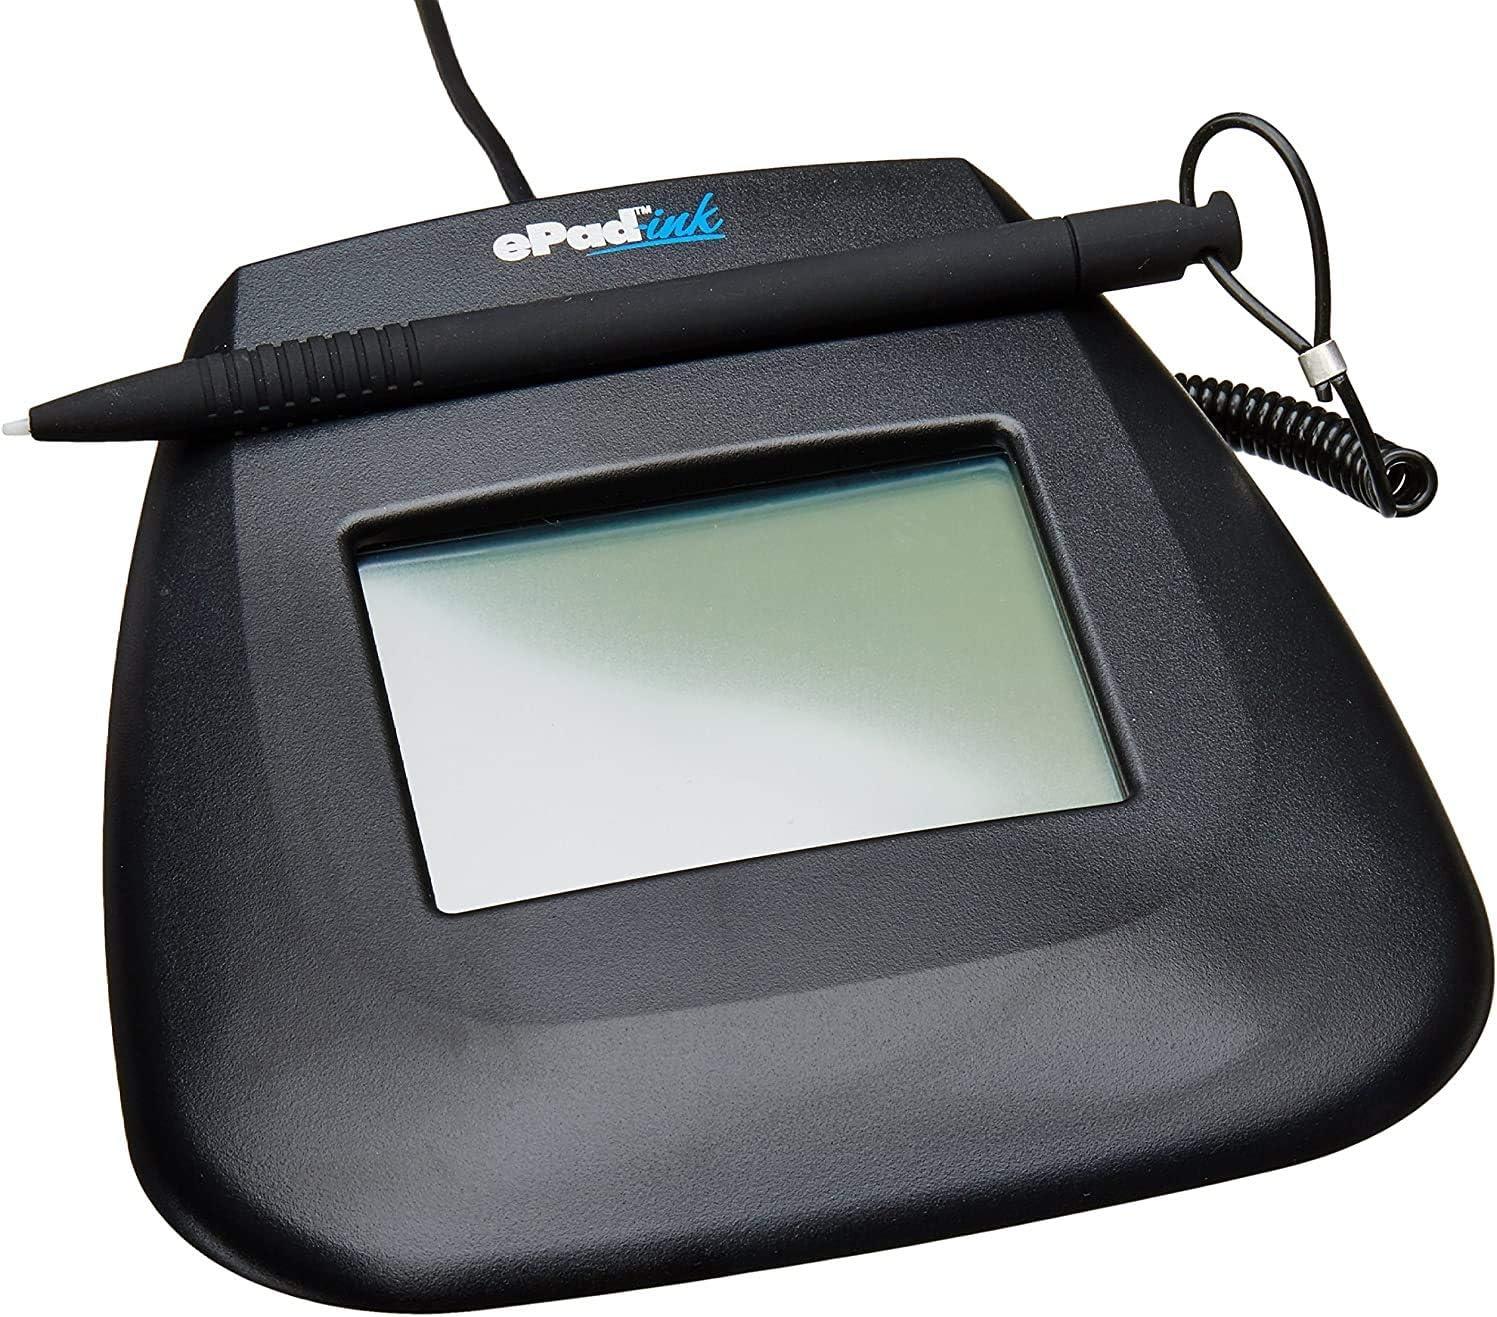 Interlink Electronics VP9805 Single Pack EPAD Ink/USB